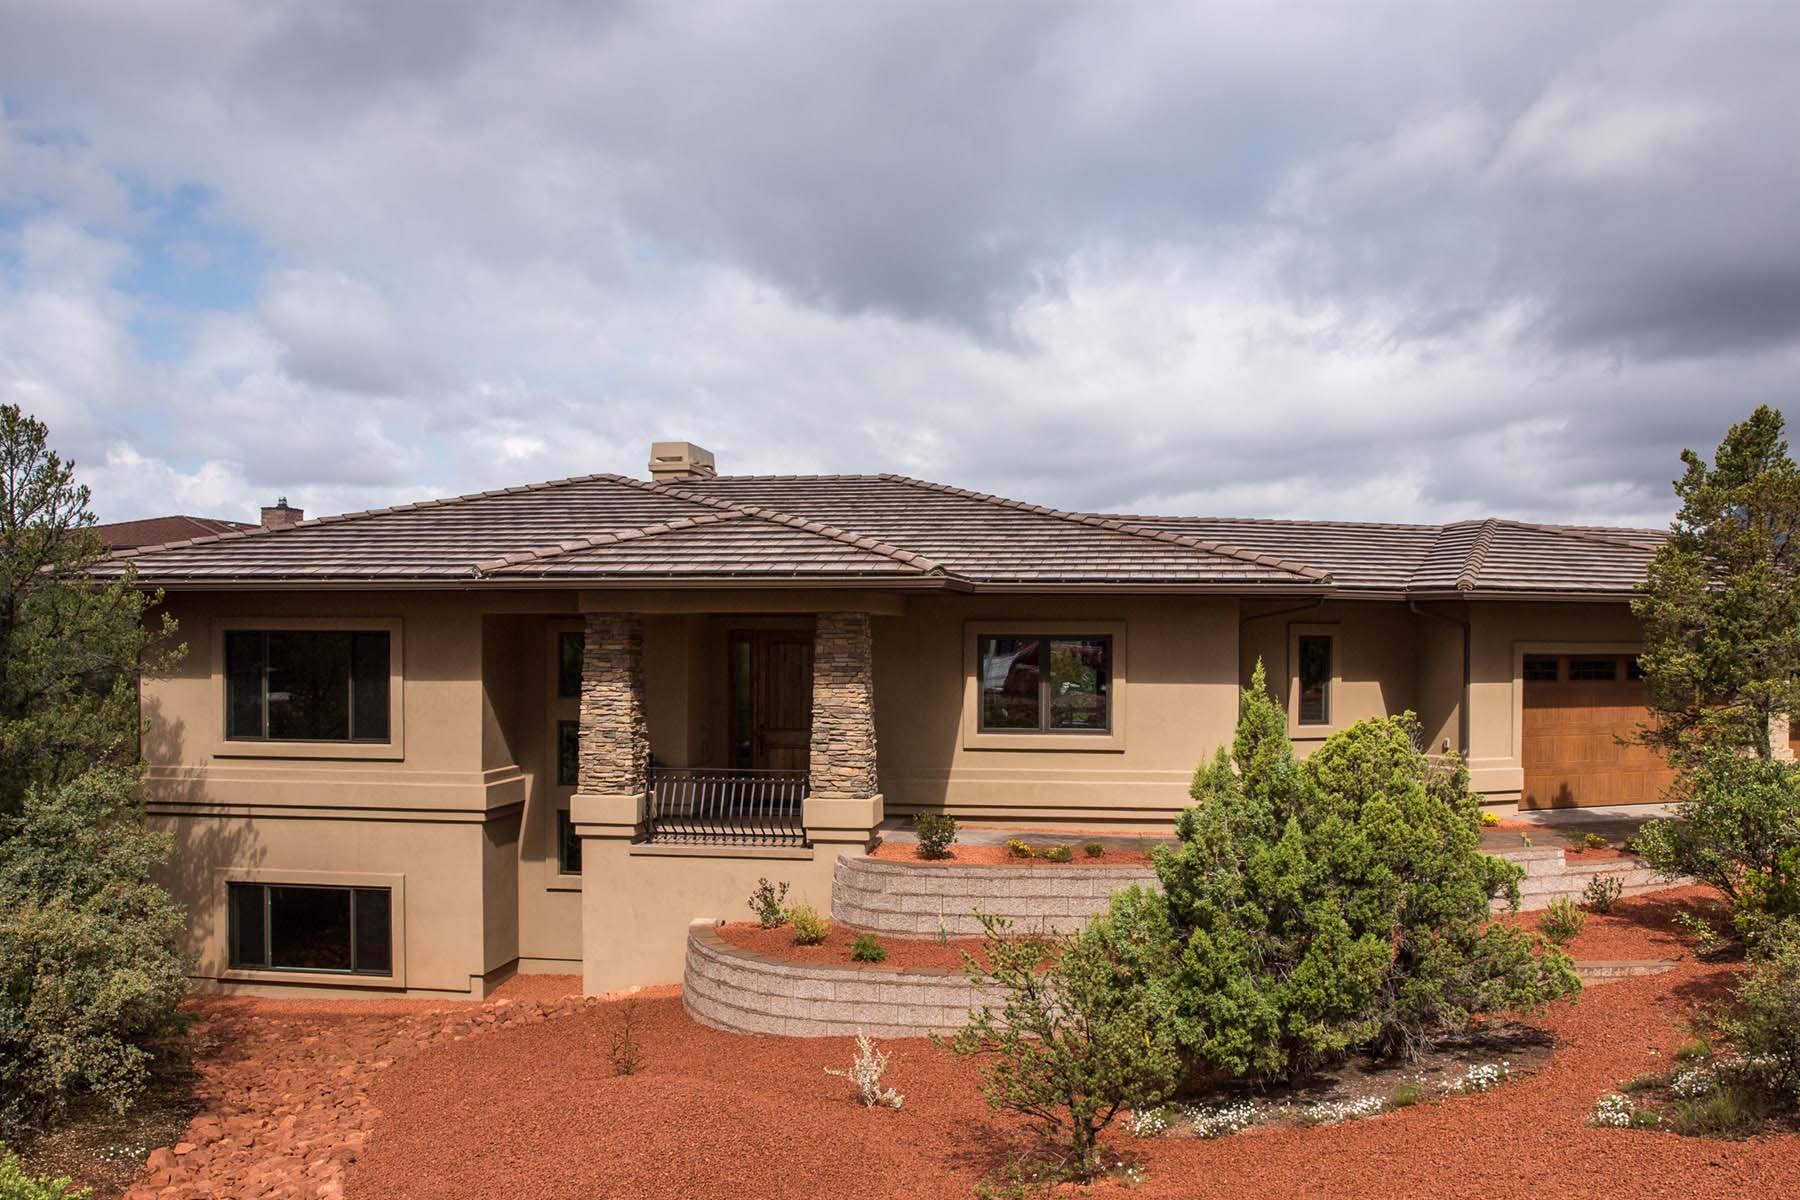 Moradia para Venda às Graced by majestic views of red rock formations. 150 Rimstone Circle Sedona, Arizona 86336 Estados Unidos